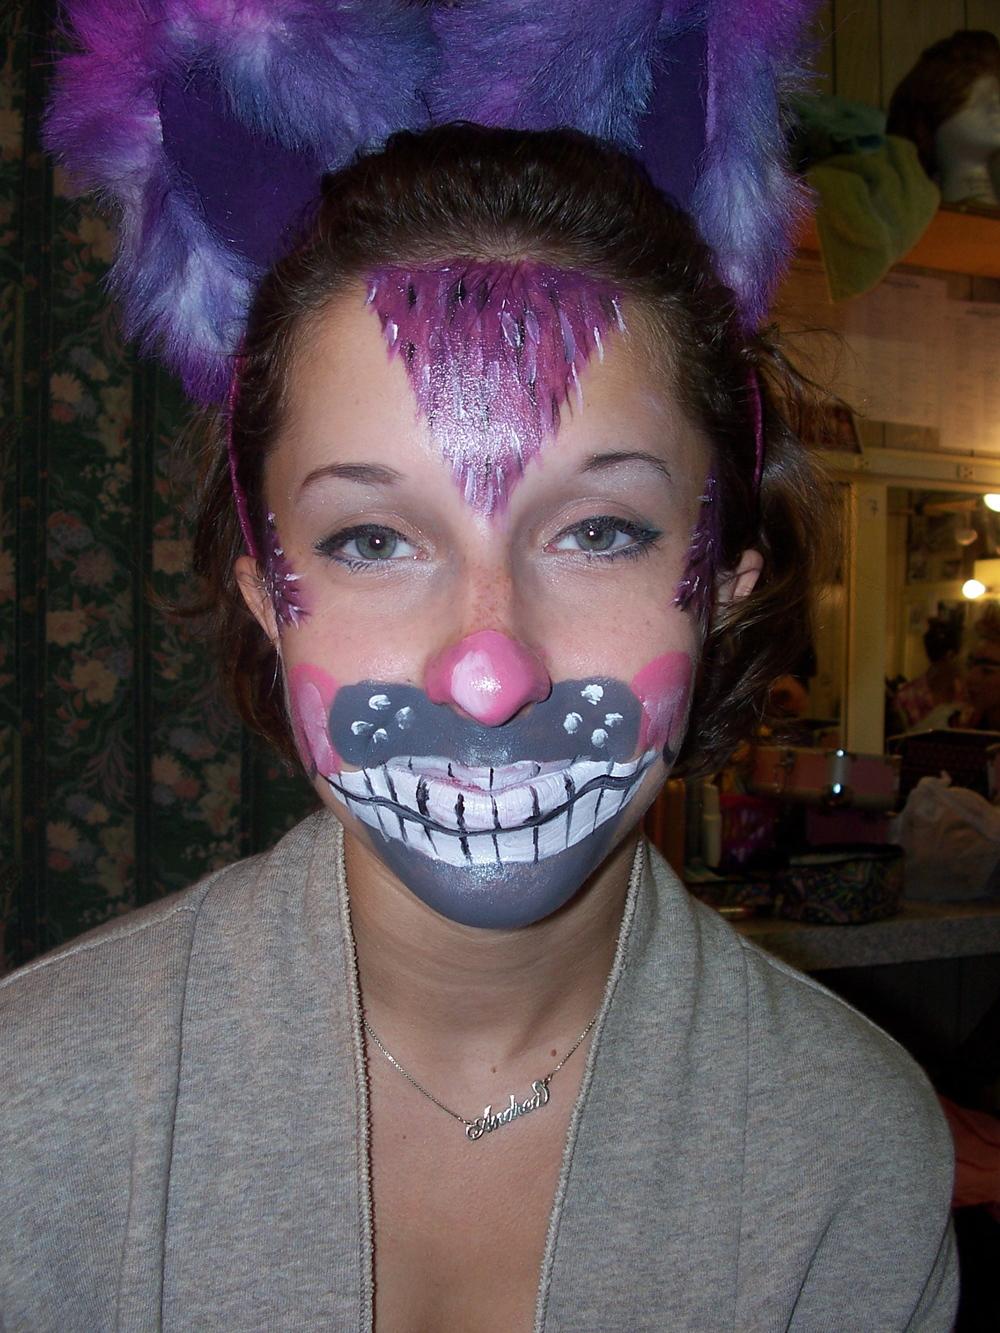 Alice in Wonderland - Cheshire Cat 1.JPG